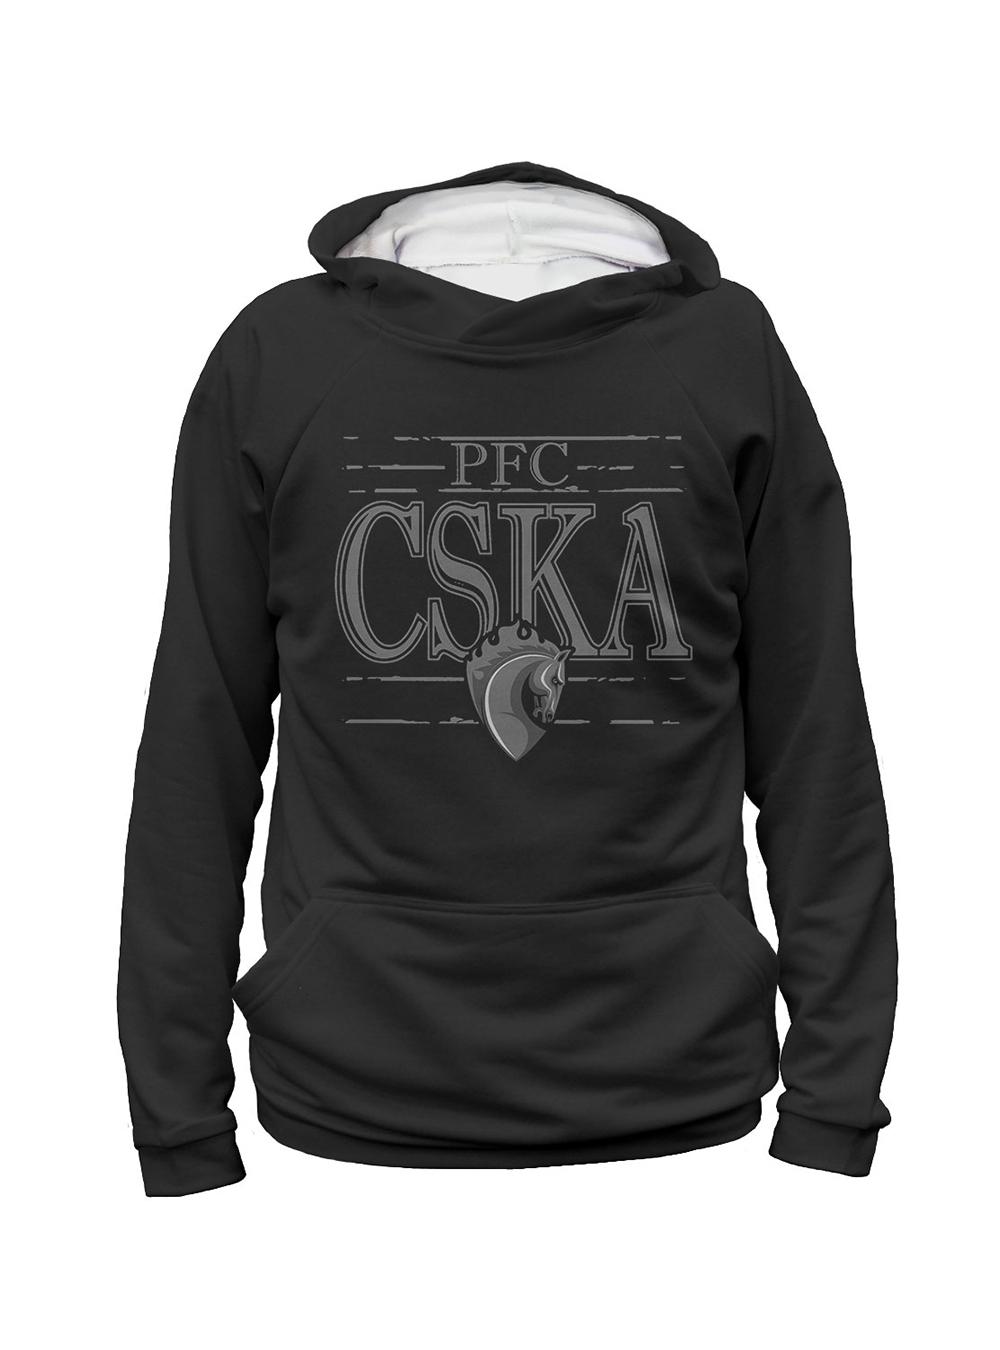 Худи PFC CSKA. Талисман (S)Одежда на заказ<br>Худи PFC CSKA. Талисман<br>